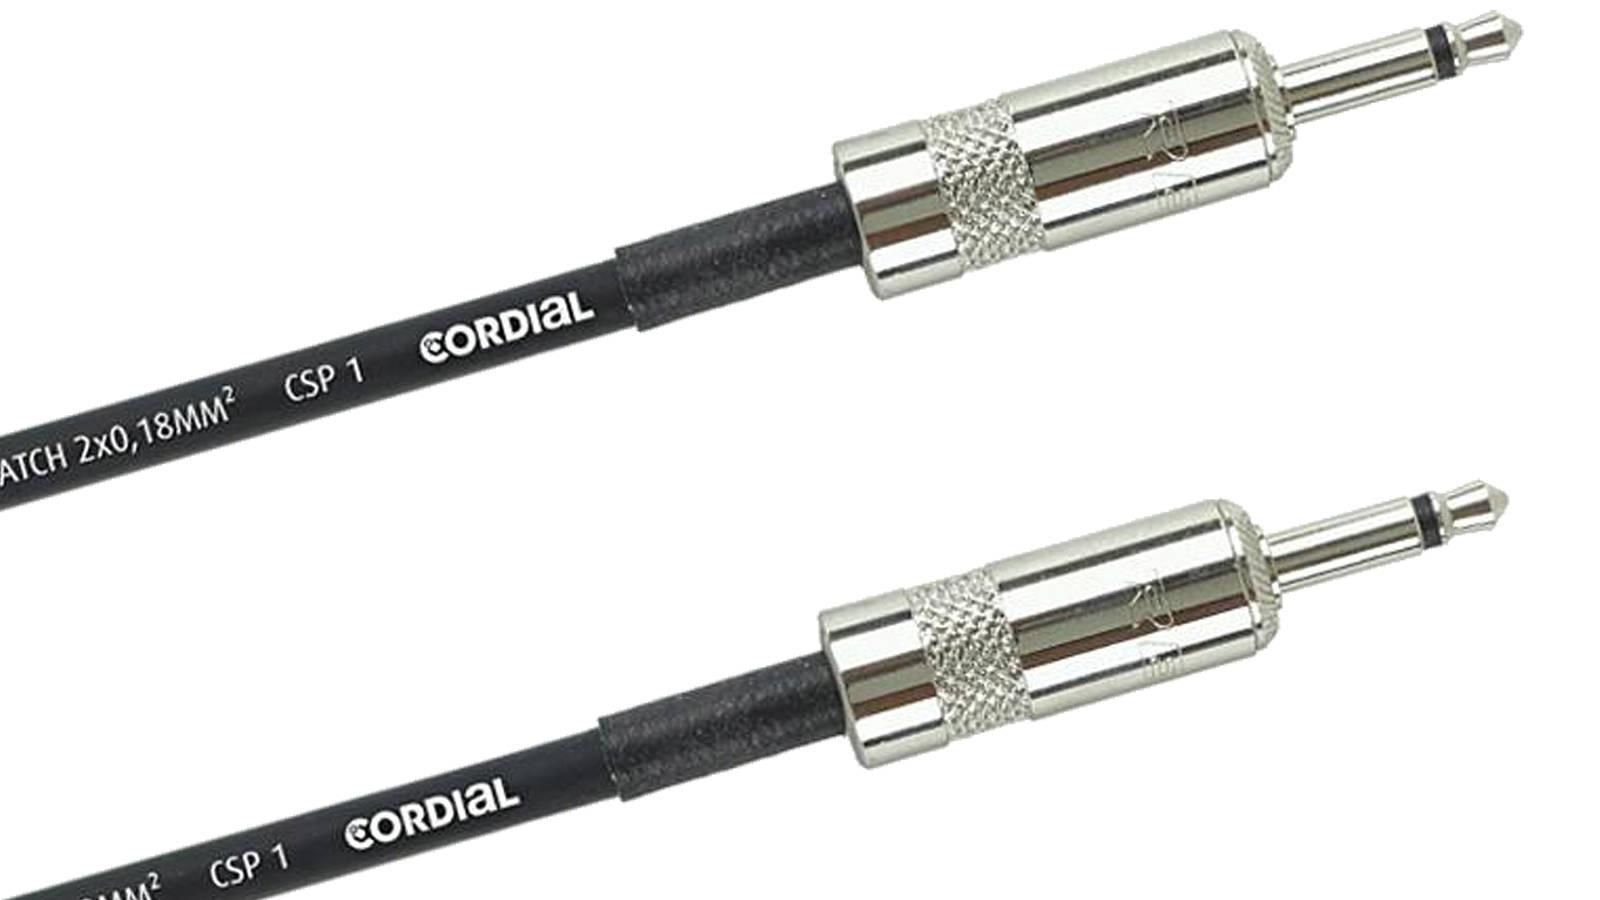 Cordial CPI 1,2 ZZ Patchkabel für Modularsysteme mKL-mKL 120 cm